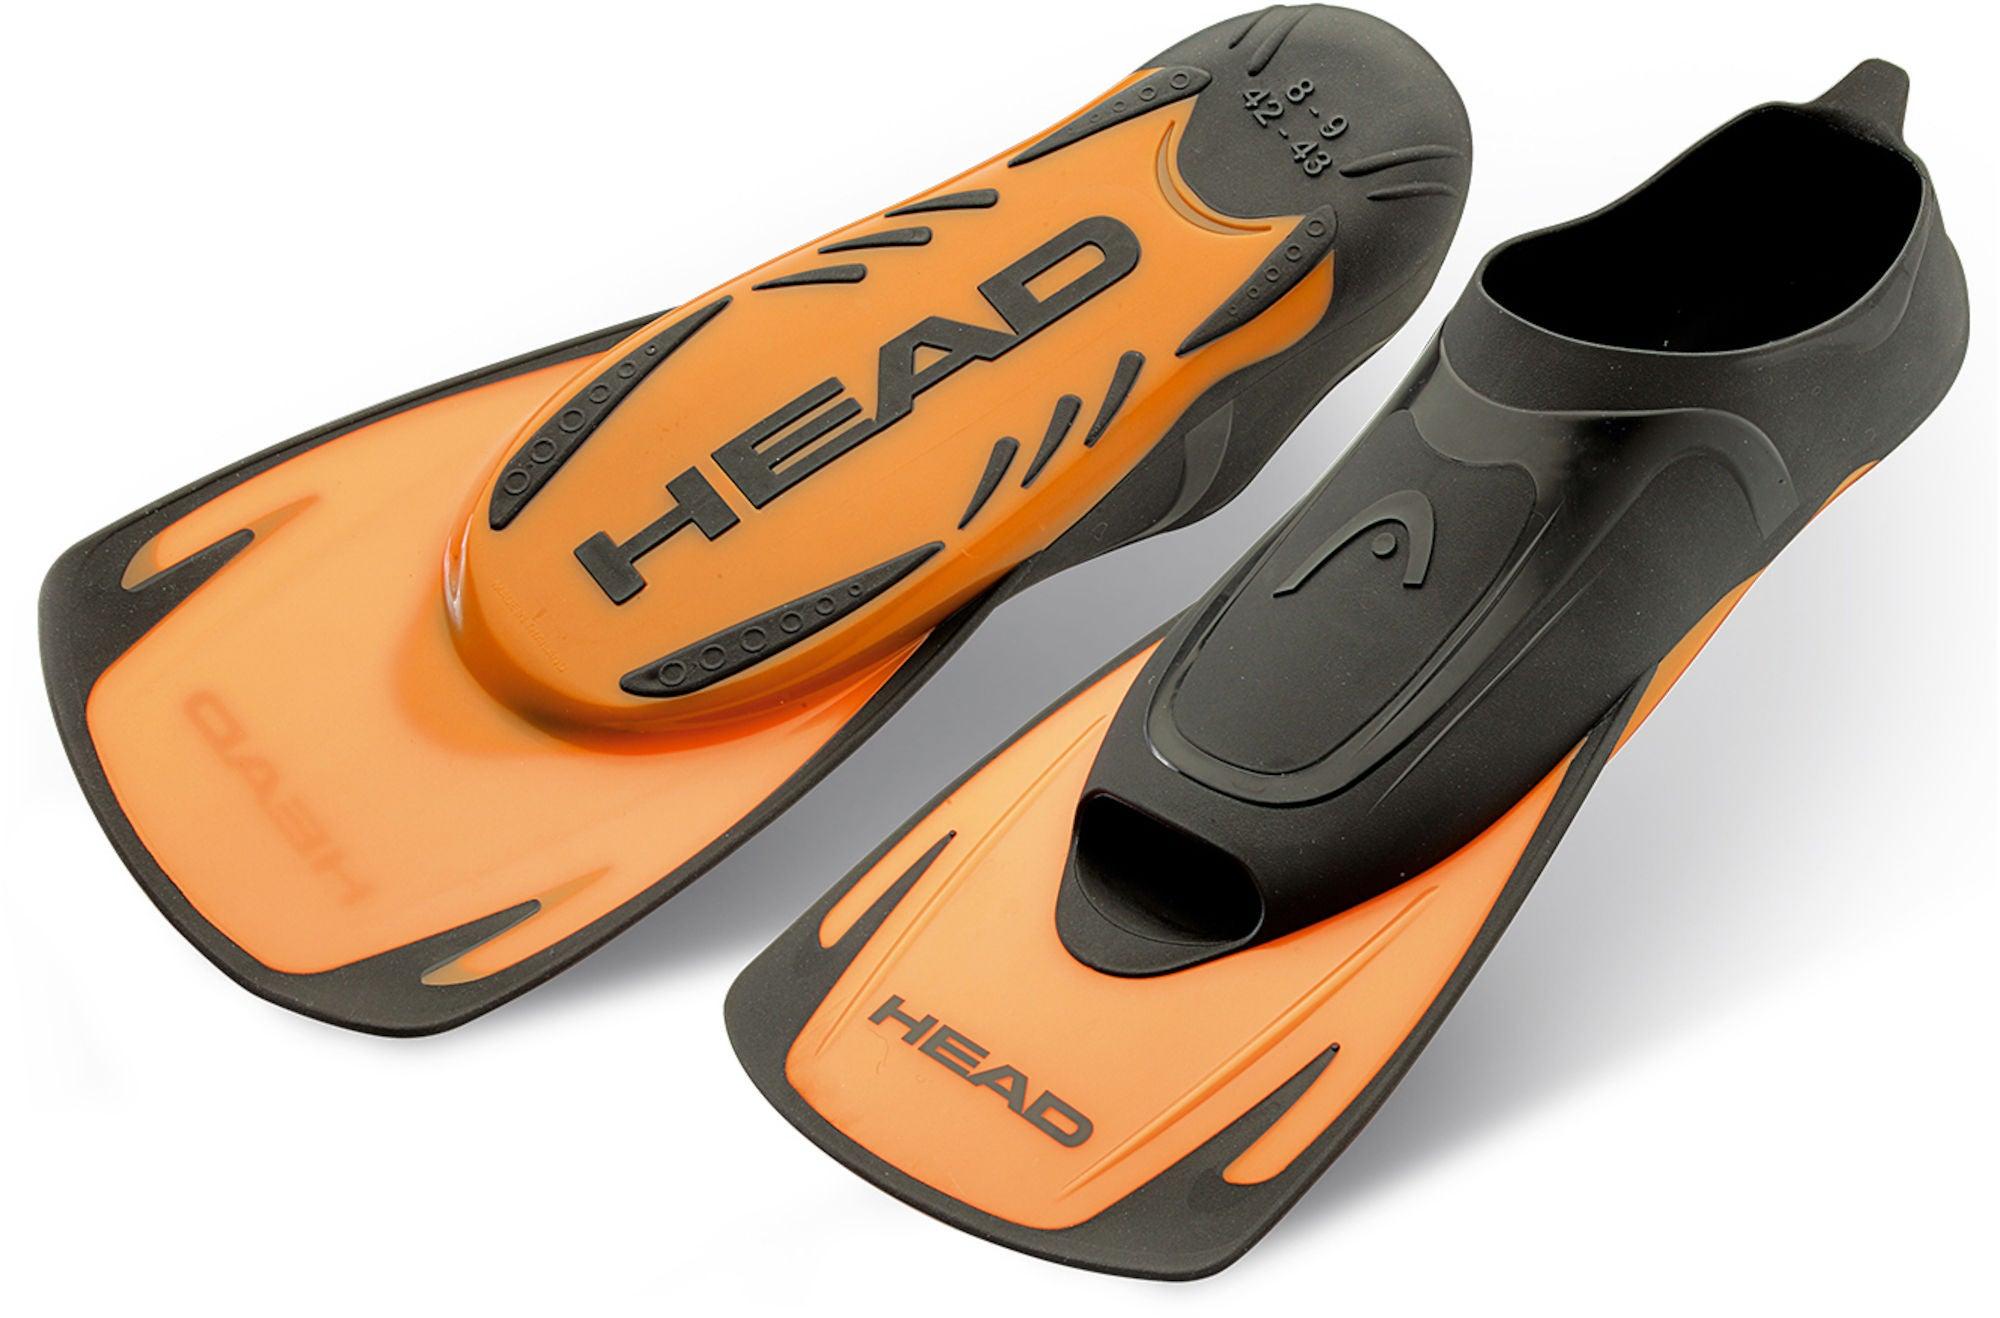 Köp HEAD Swim Fin Energy Simfötter ef1acf12e13b2